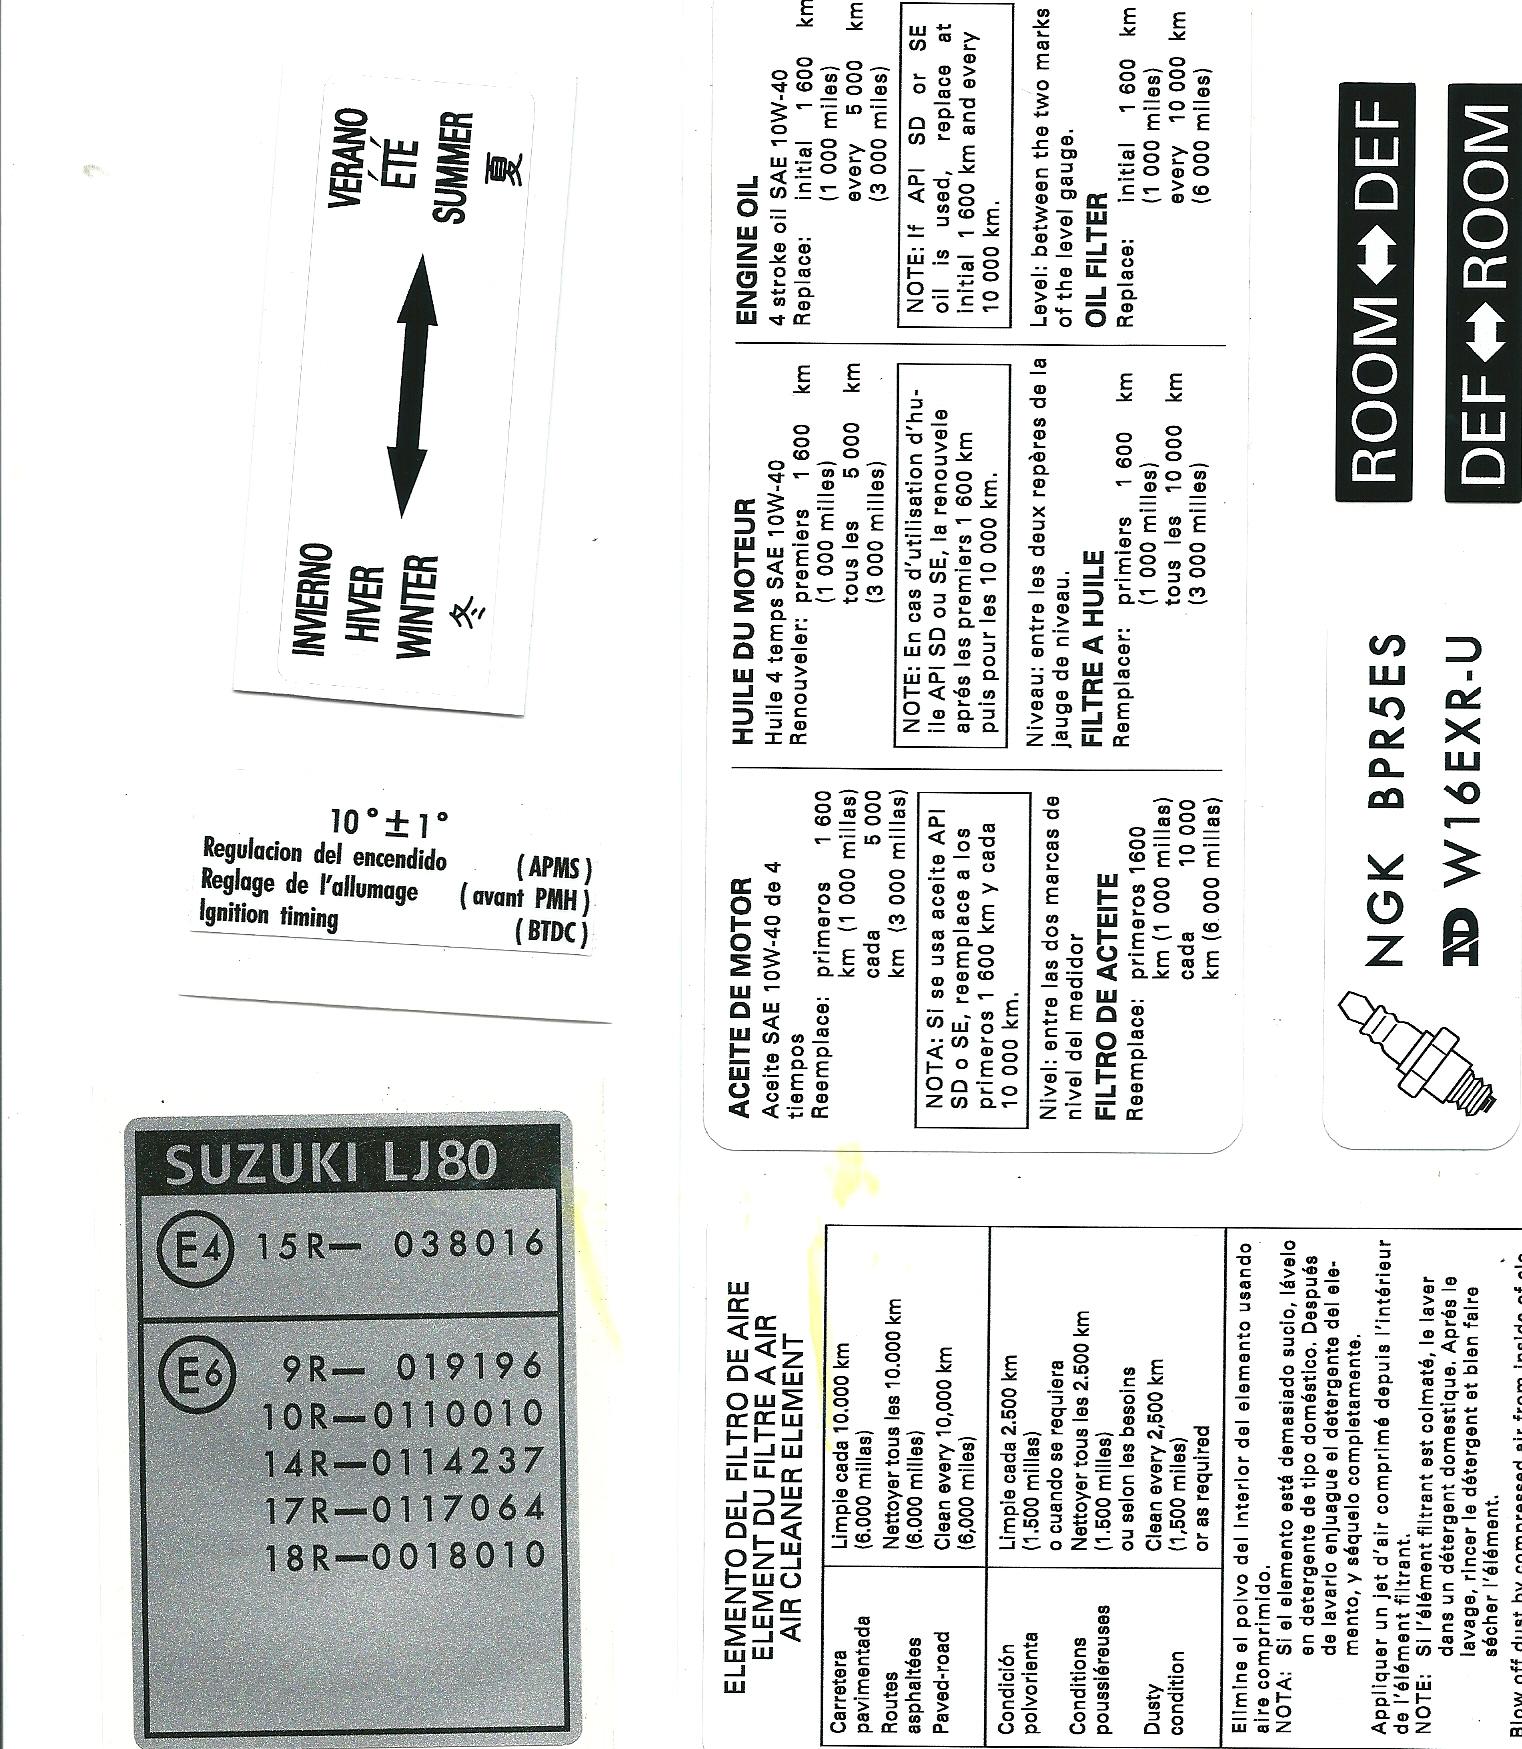 Suzuki Lj80 Decal Set Sticker Set